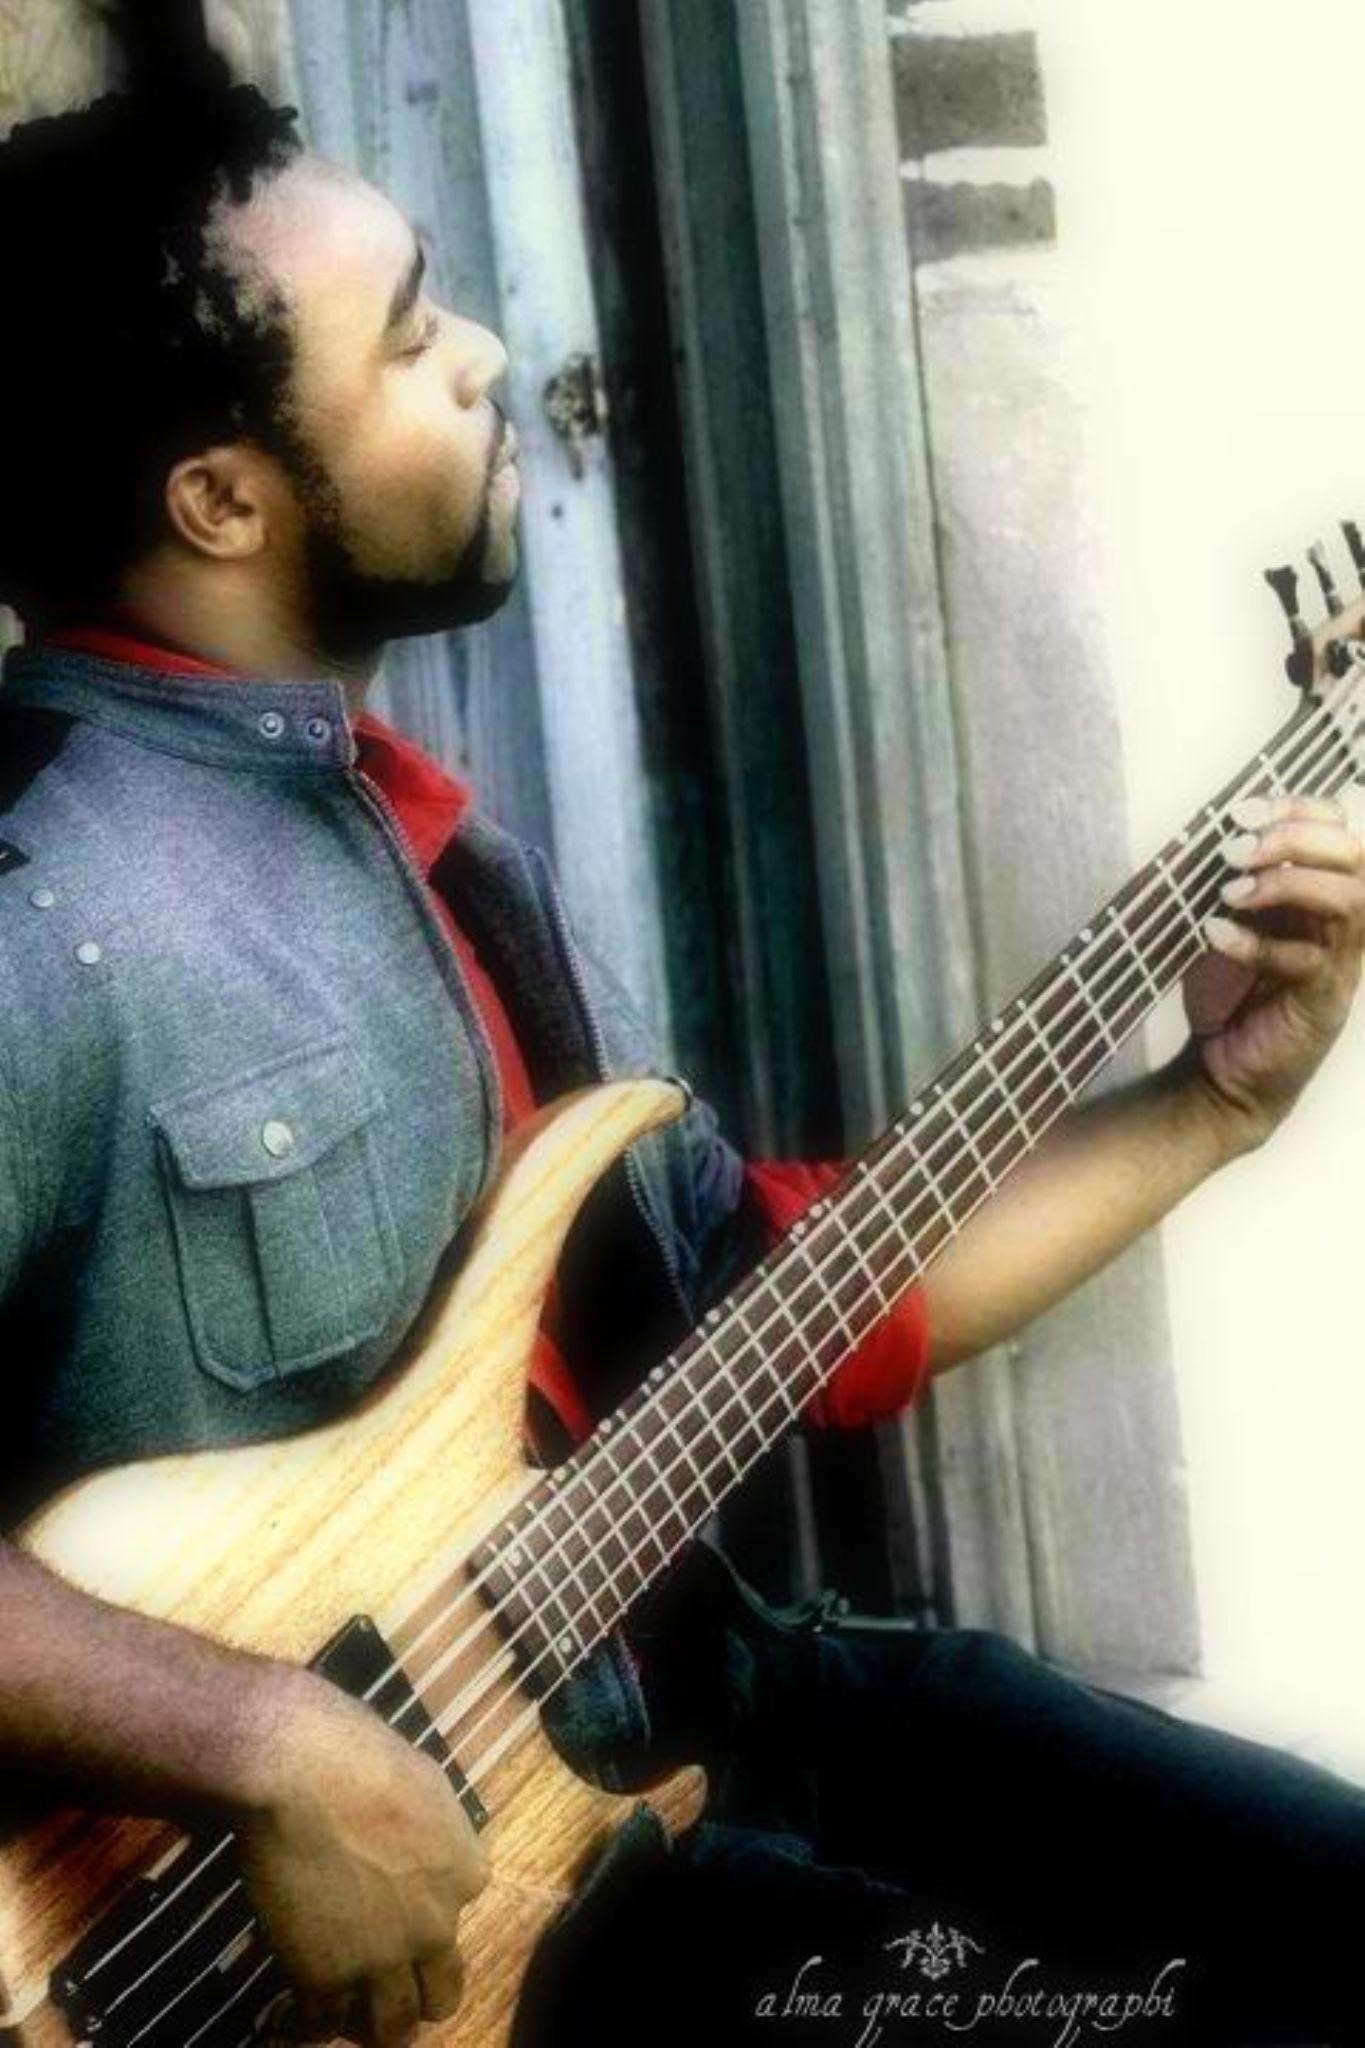 Guitar Man by cristirenea